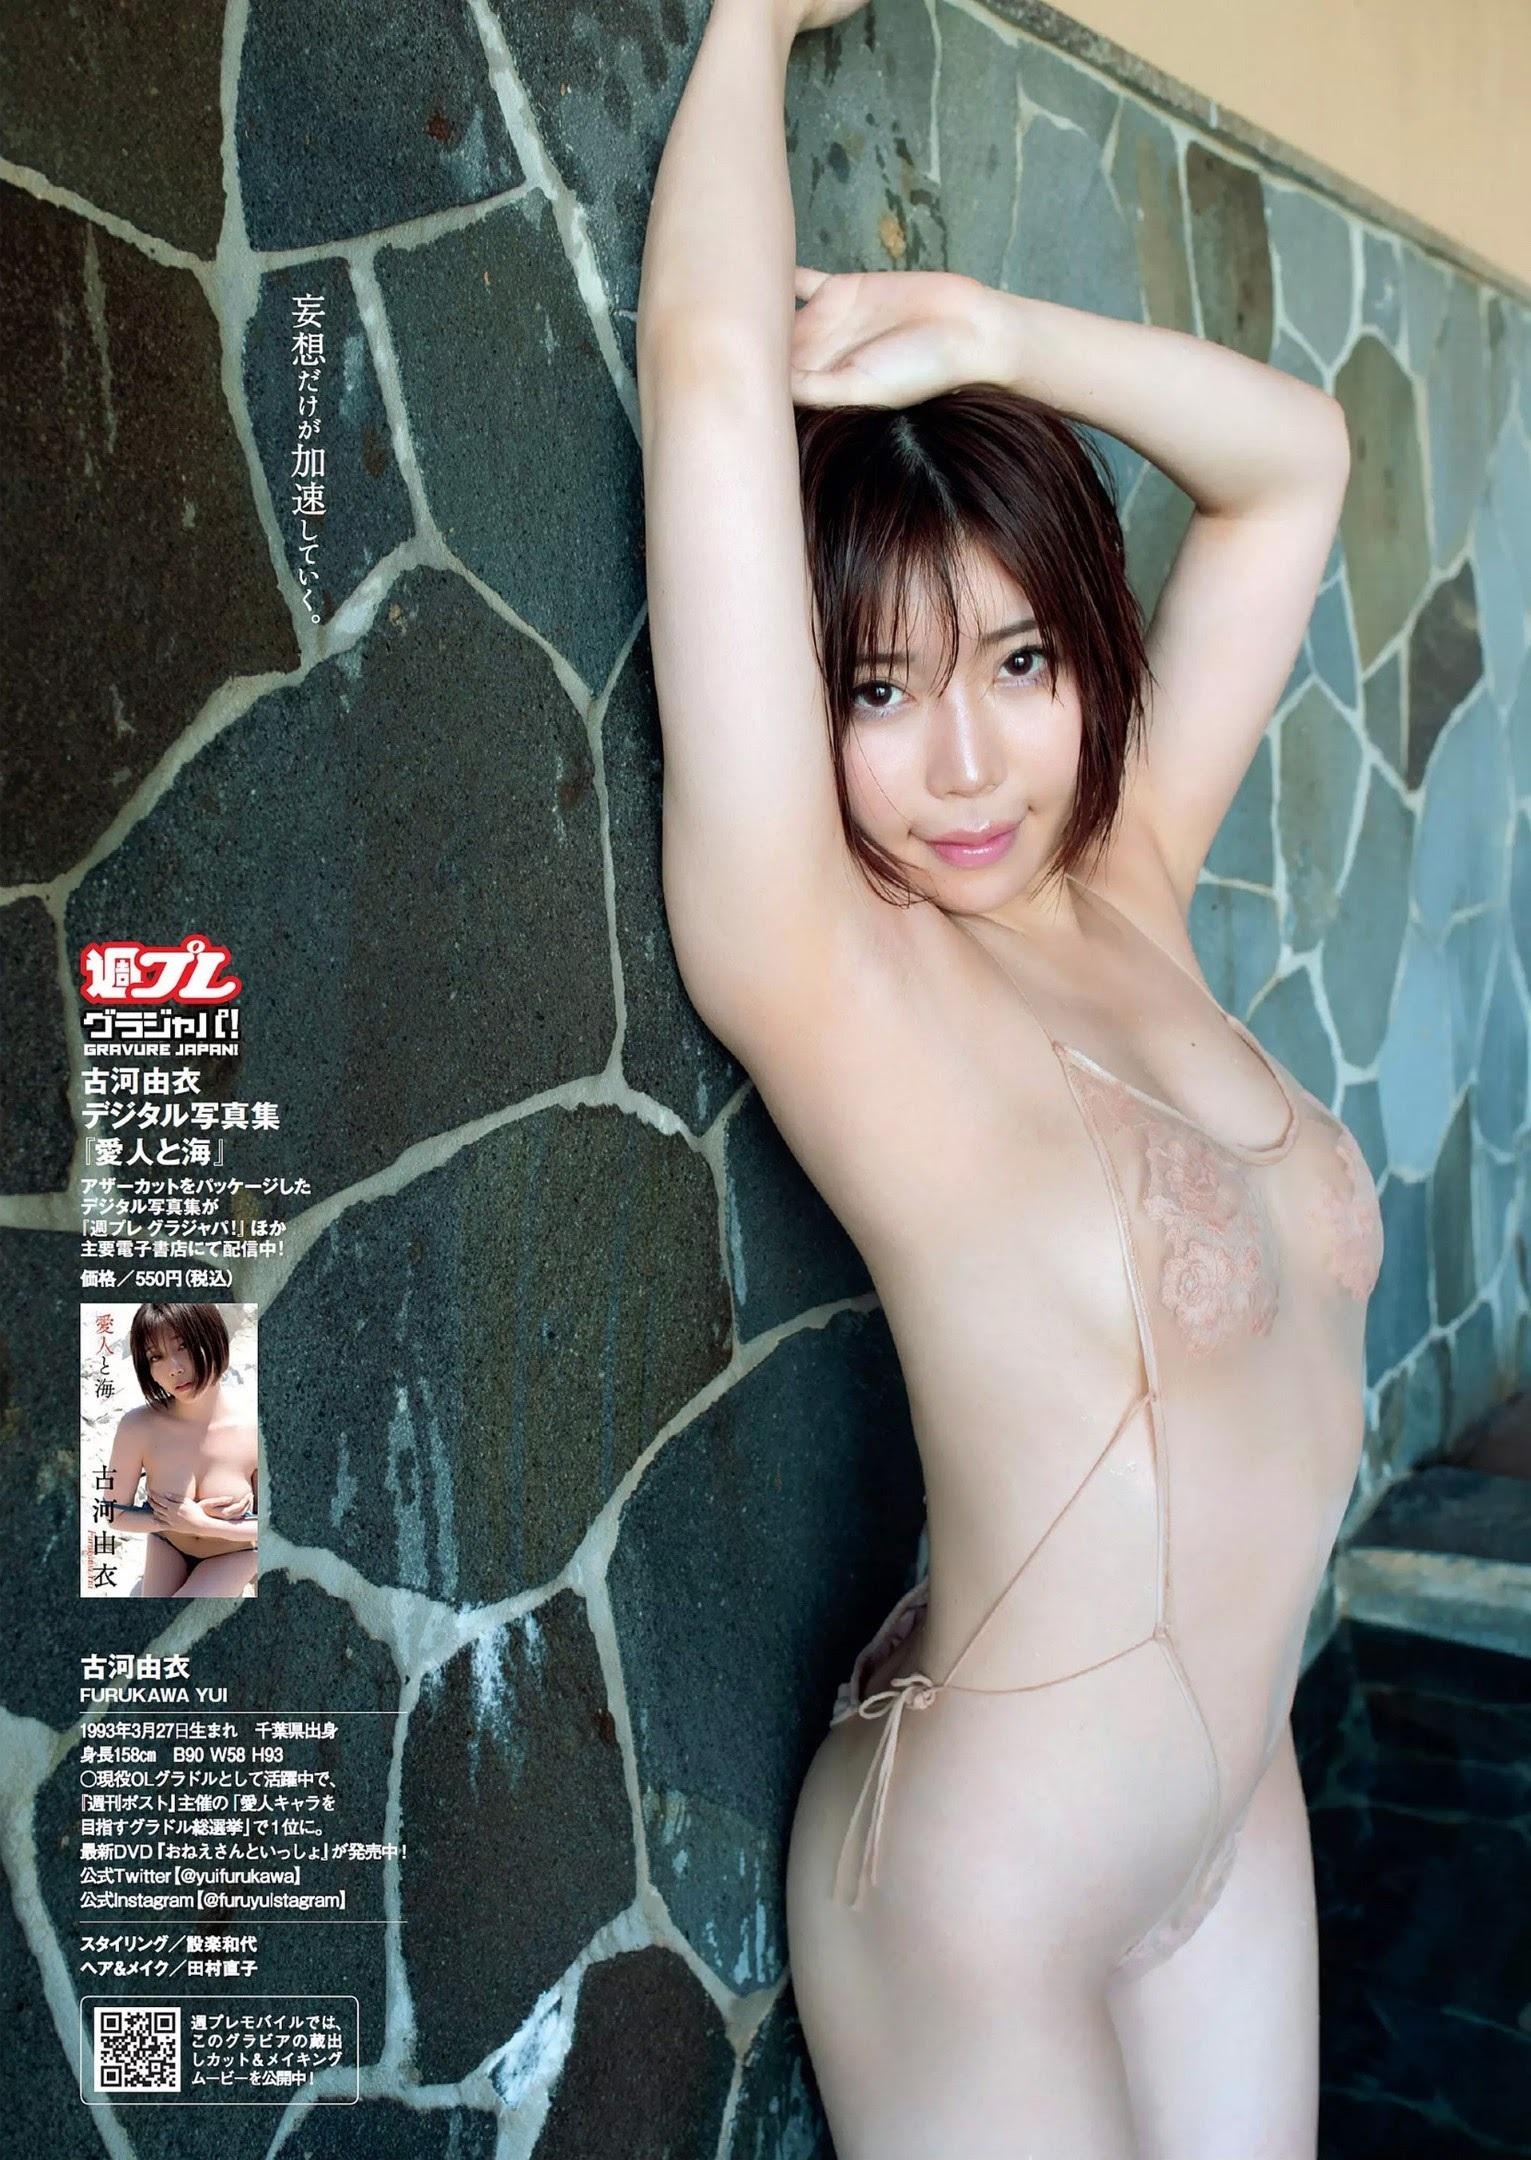 She is popular as a gramador and also an office workerShe has two faces in her amorous bikini gravureYui Furukawa 2020004